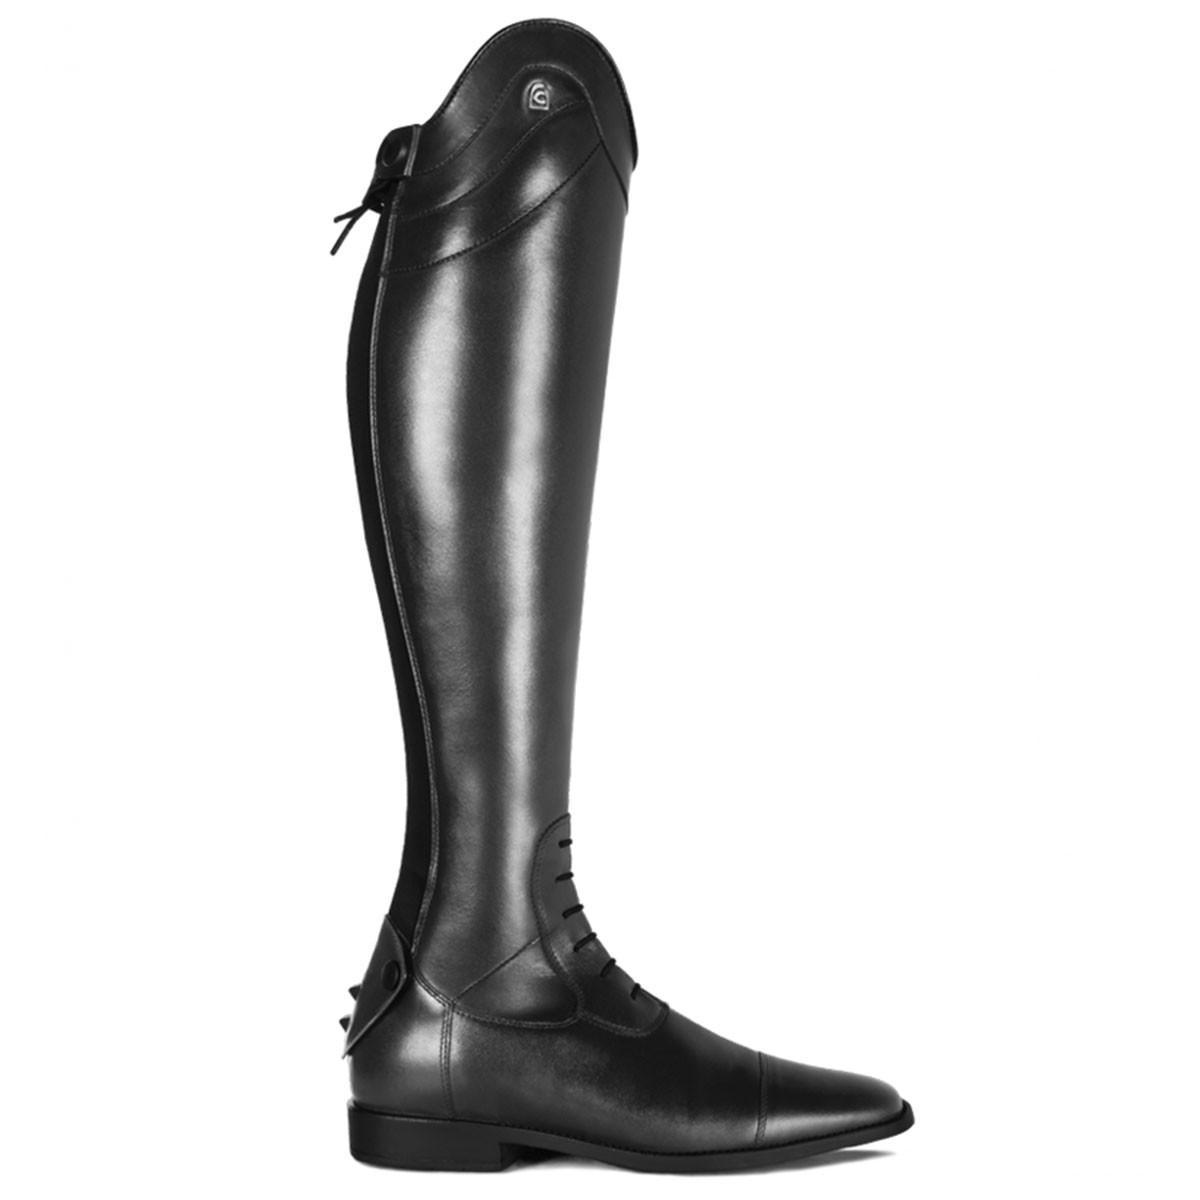 Cavallo Linus Slim rijlaars zwart maat:7-7.5 / h49-w37